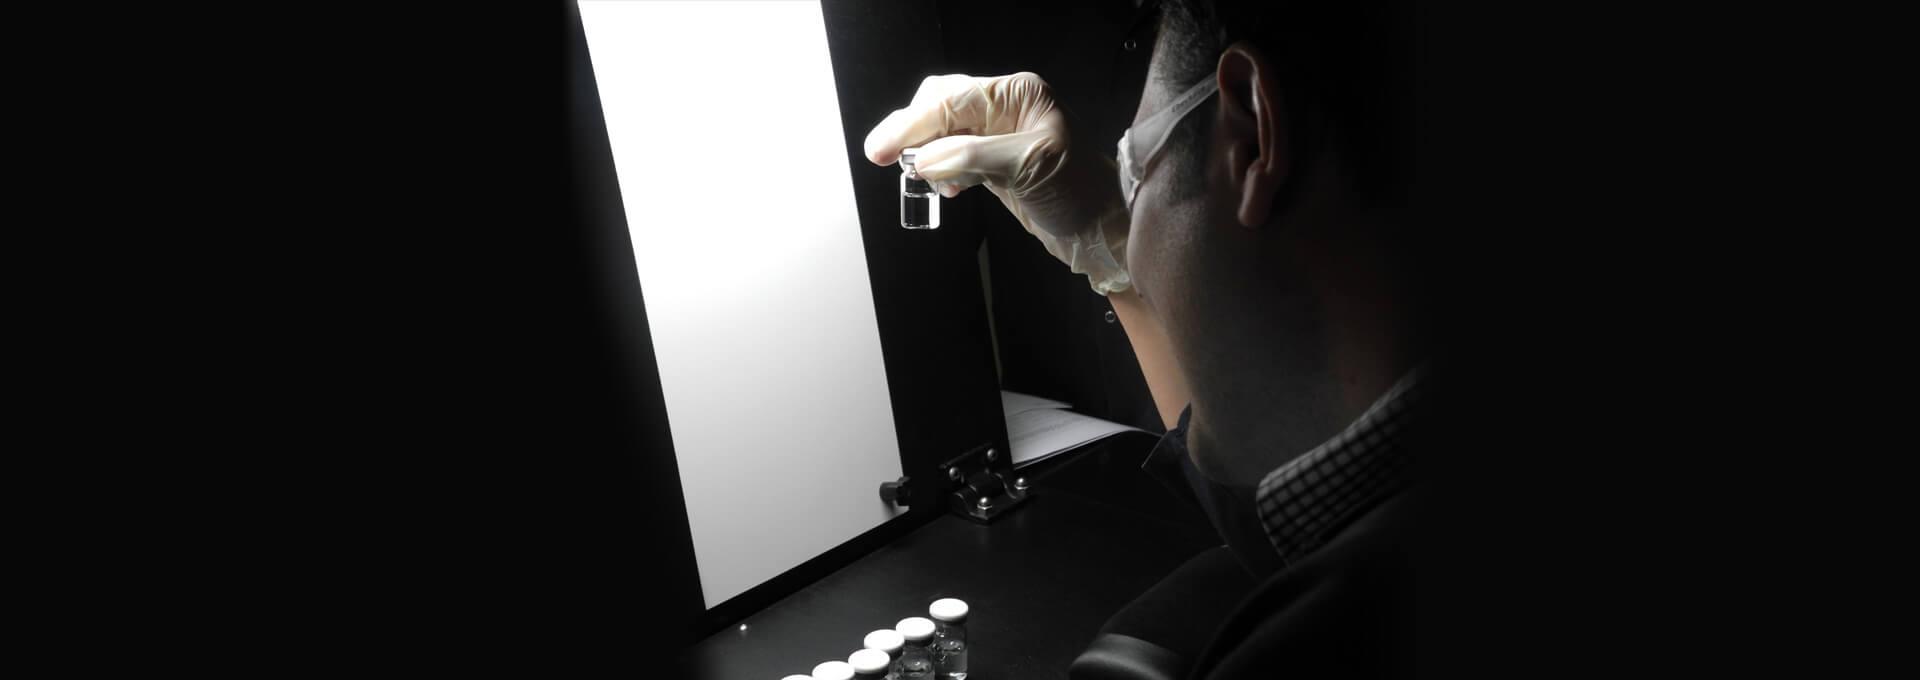 Visual Inspection Training at PDA